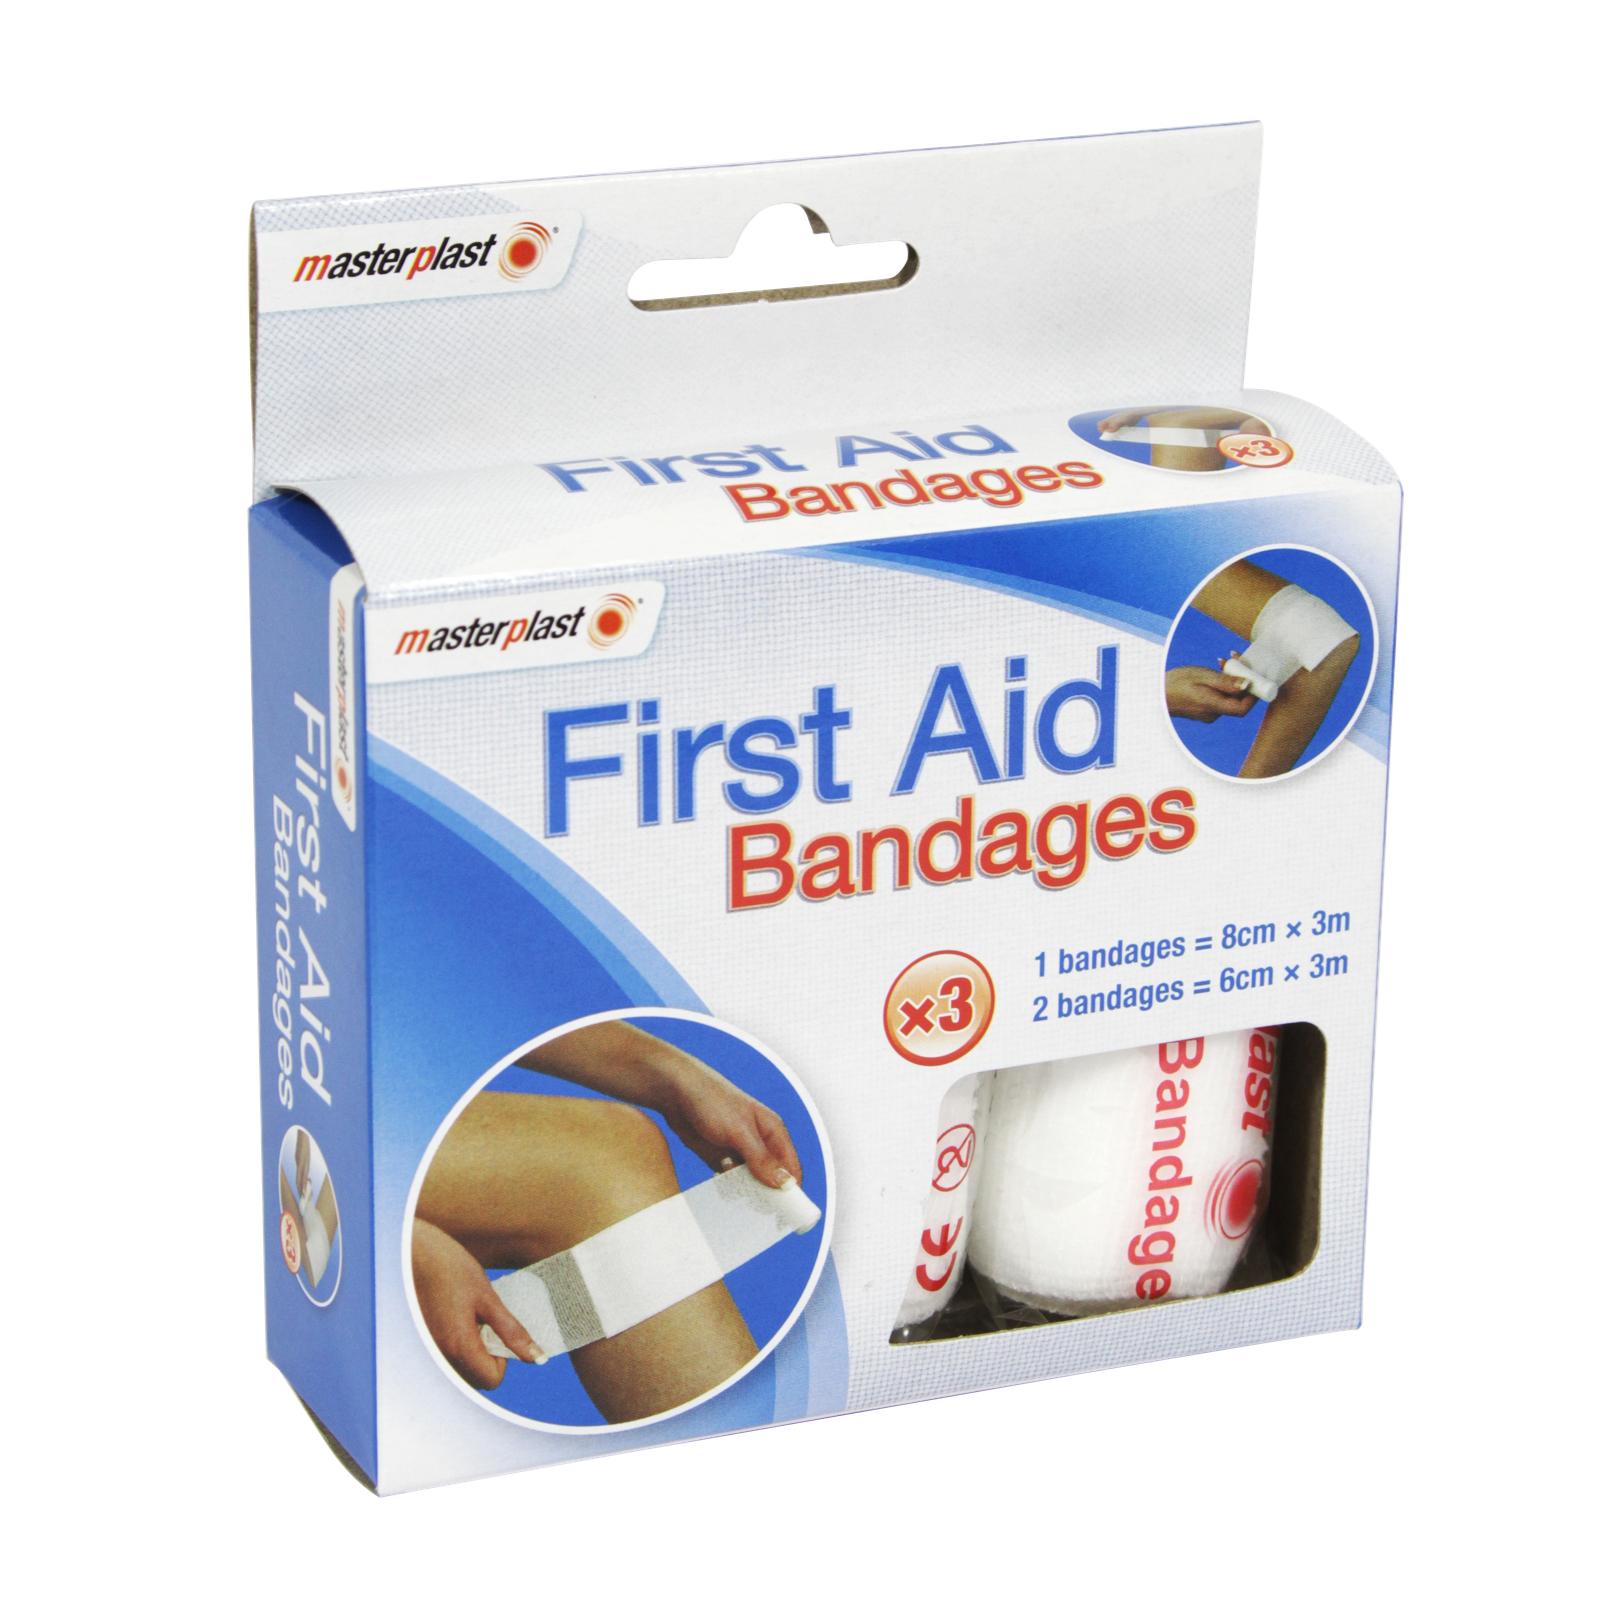 MASTER PLASTER 4PK 1ST AID BANDAGES